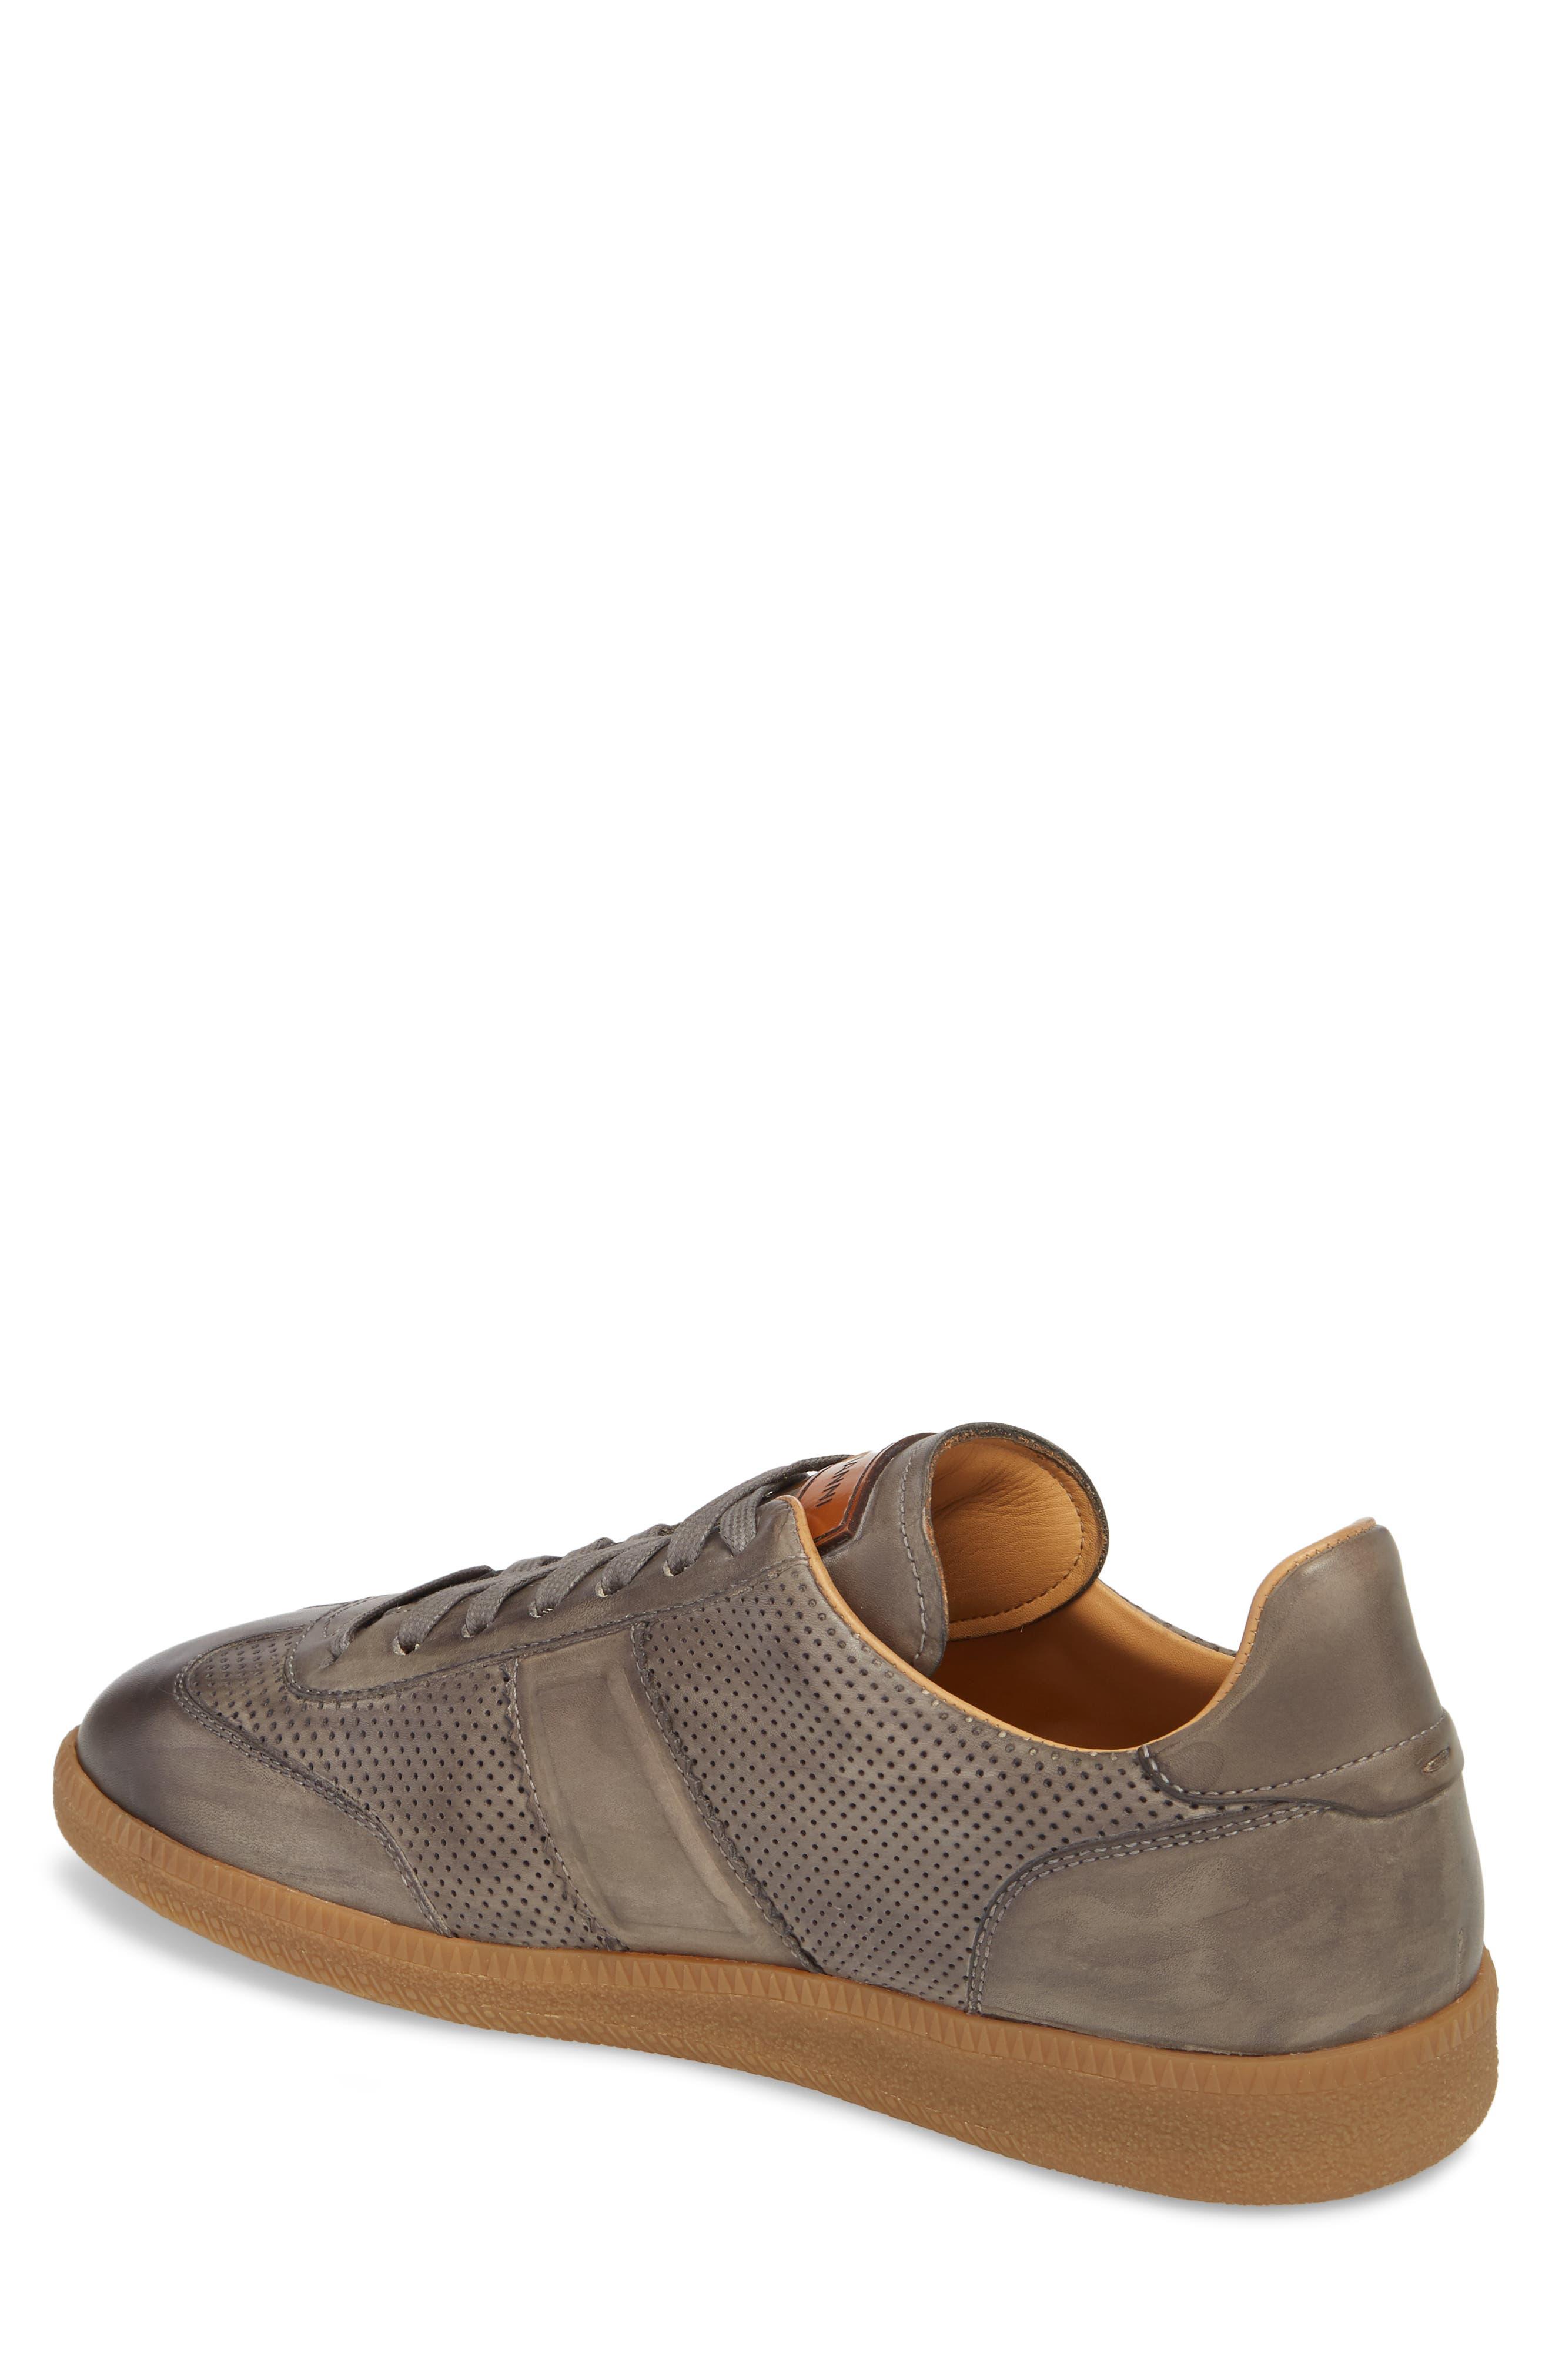 Xavi Embossed Low Top Sneaker,                             Alternate thumbnail 2, color,                             Grey/ Grey Leather